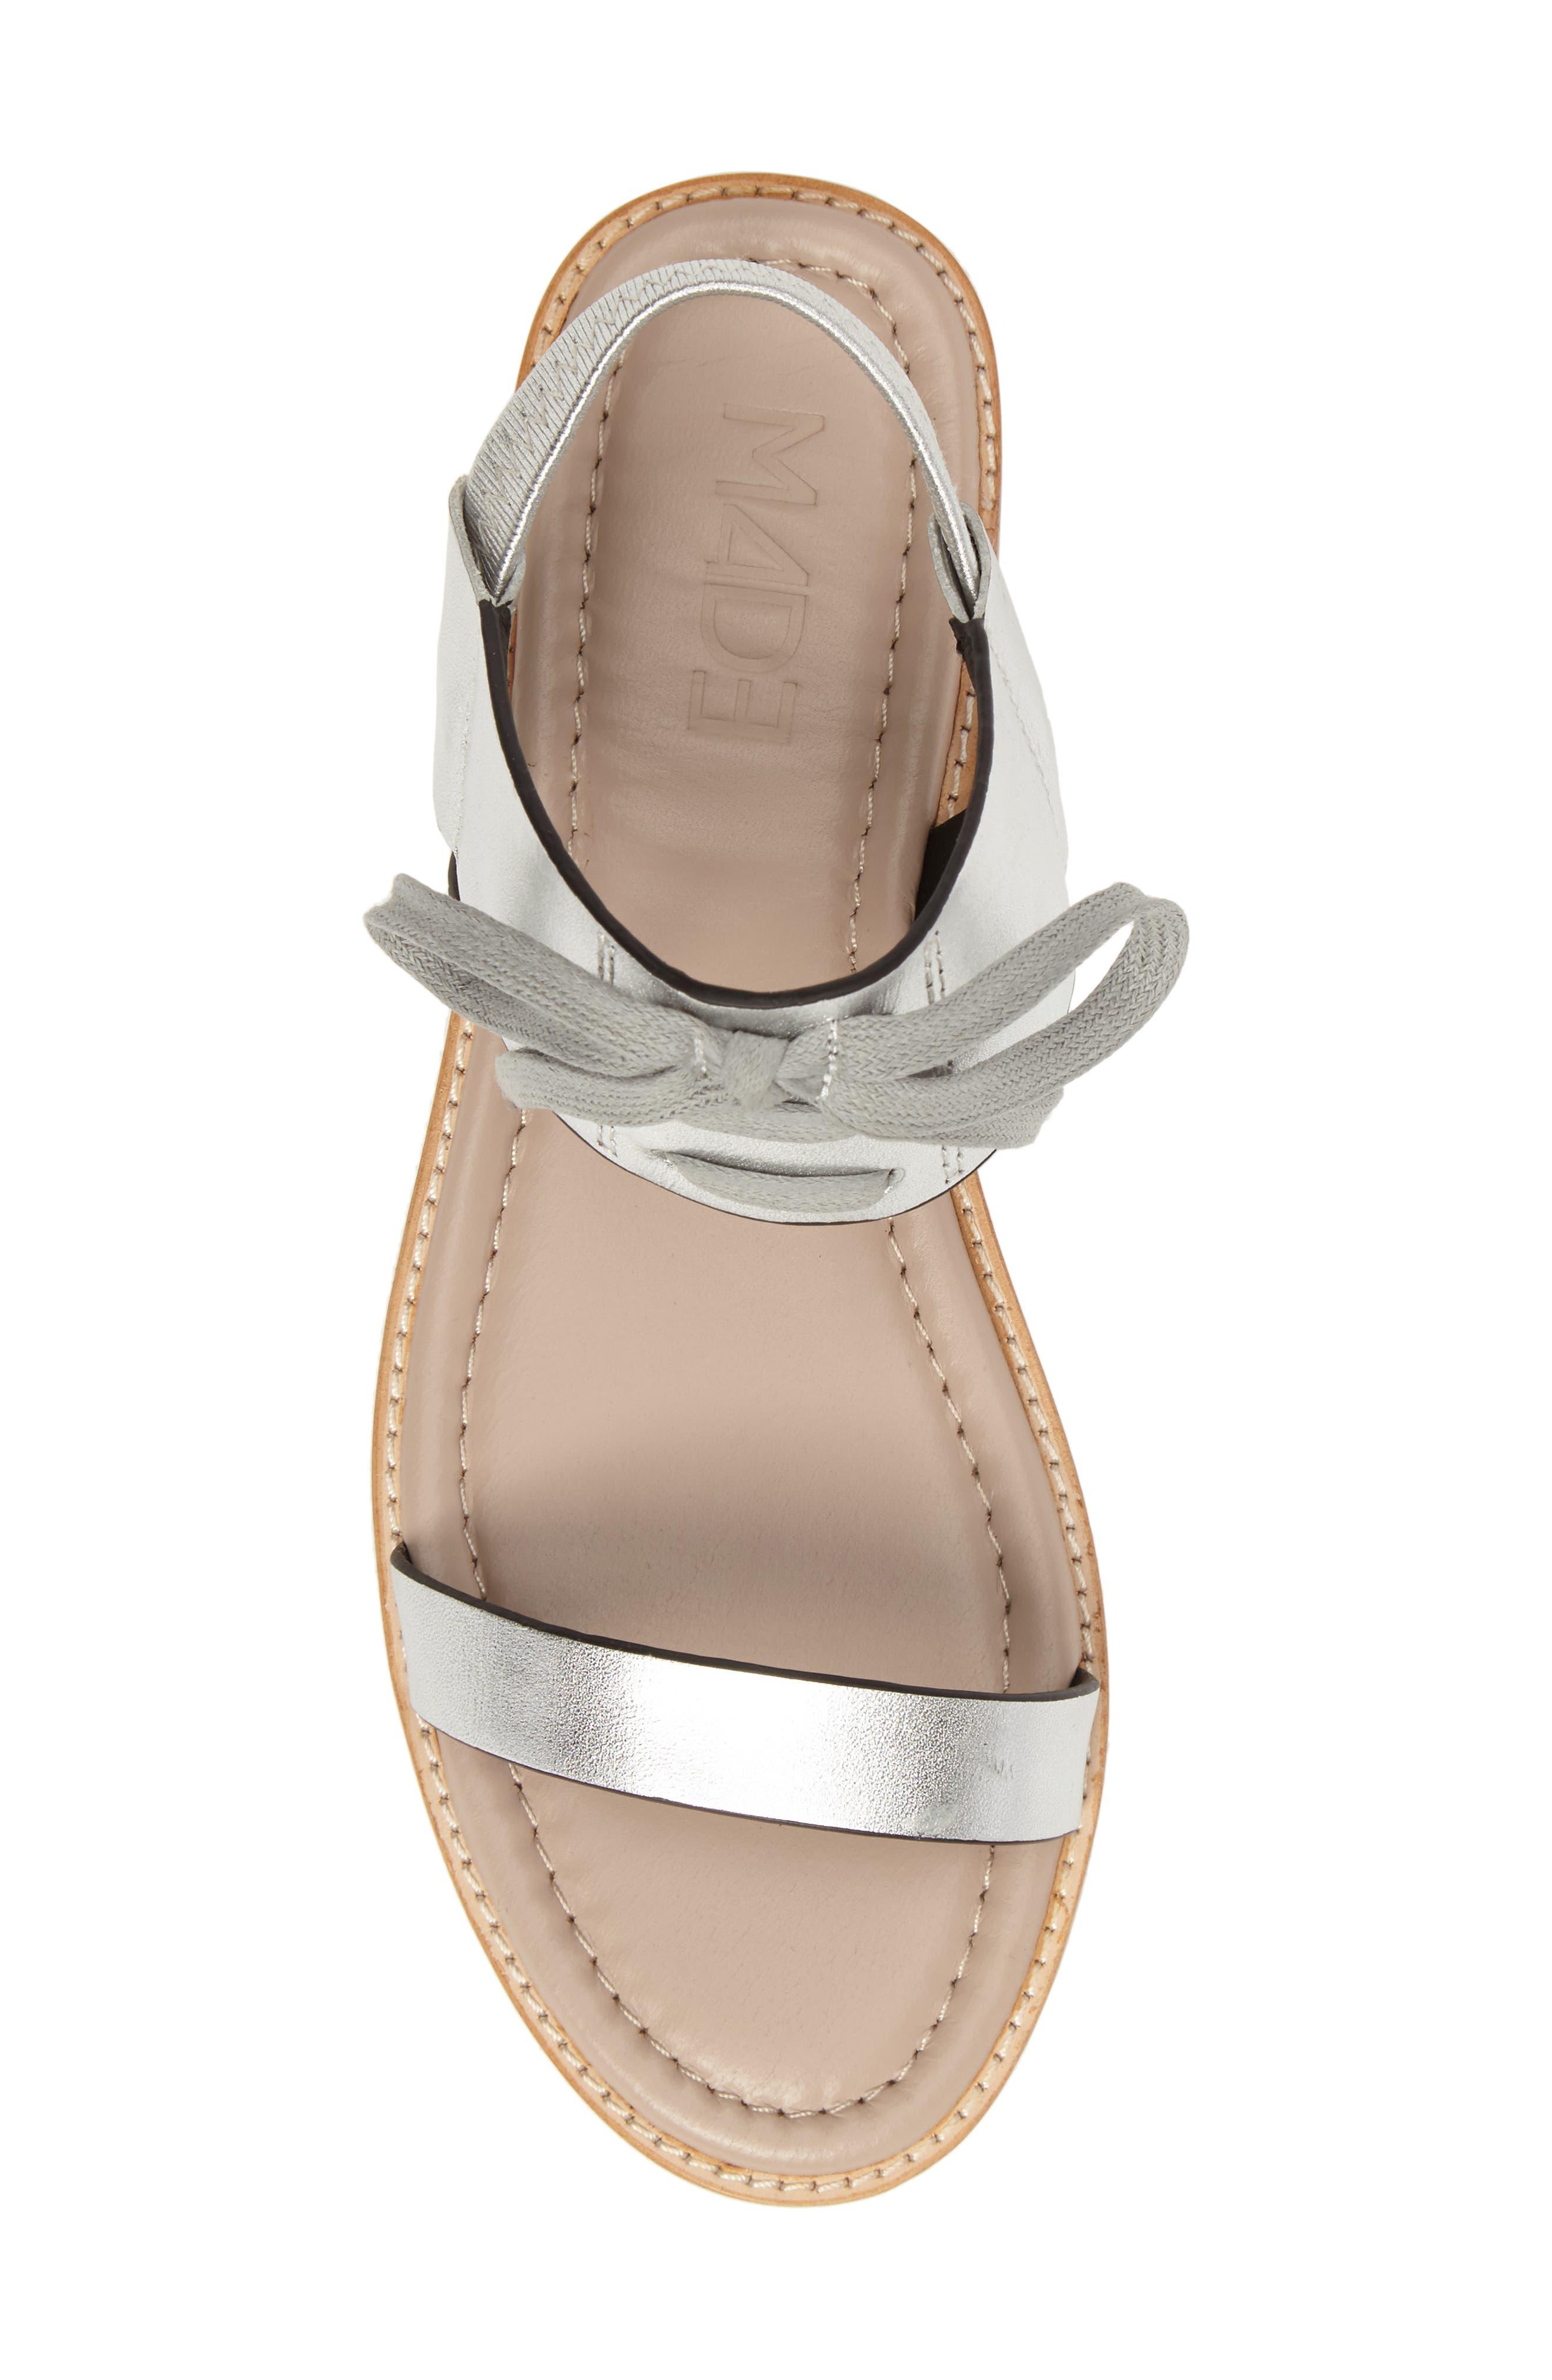 M4D3 Hailey Slingback Sandal,                             Alternate thumbnail 5, color,                             Silver Leather